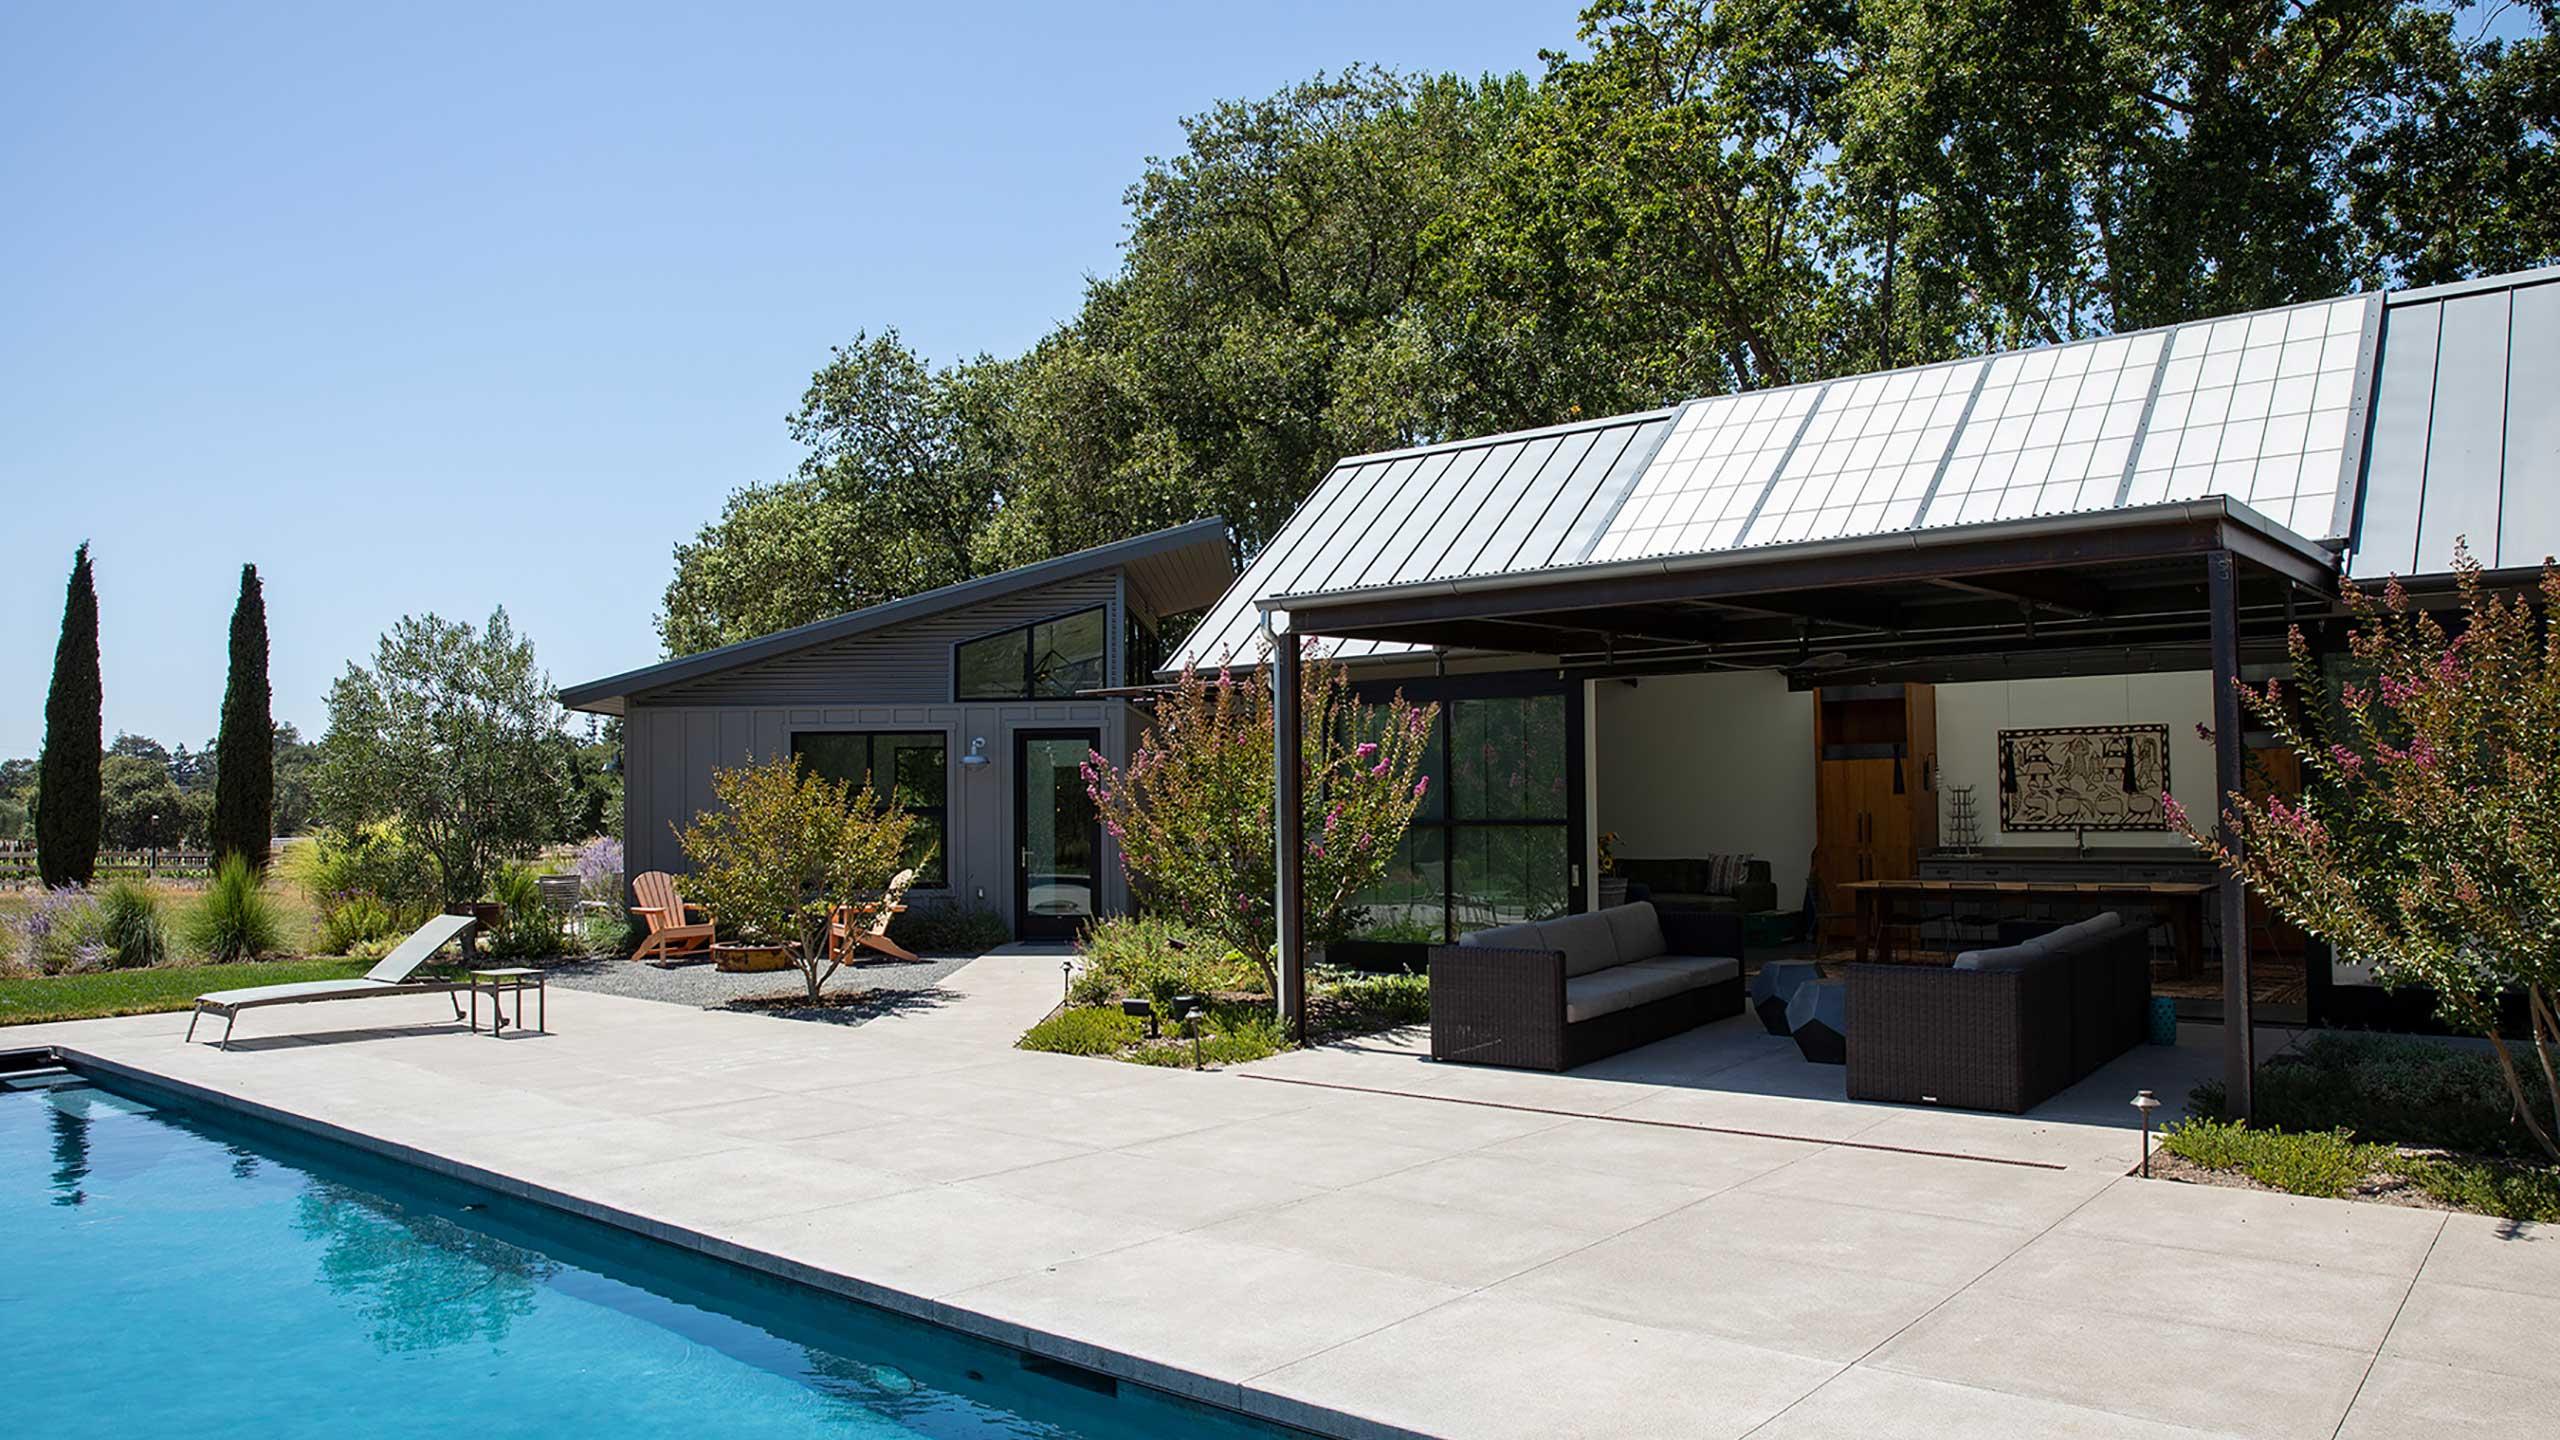 Napa-Farmhouse-pool-landscape-and-outbuildings